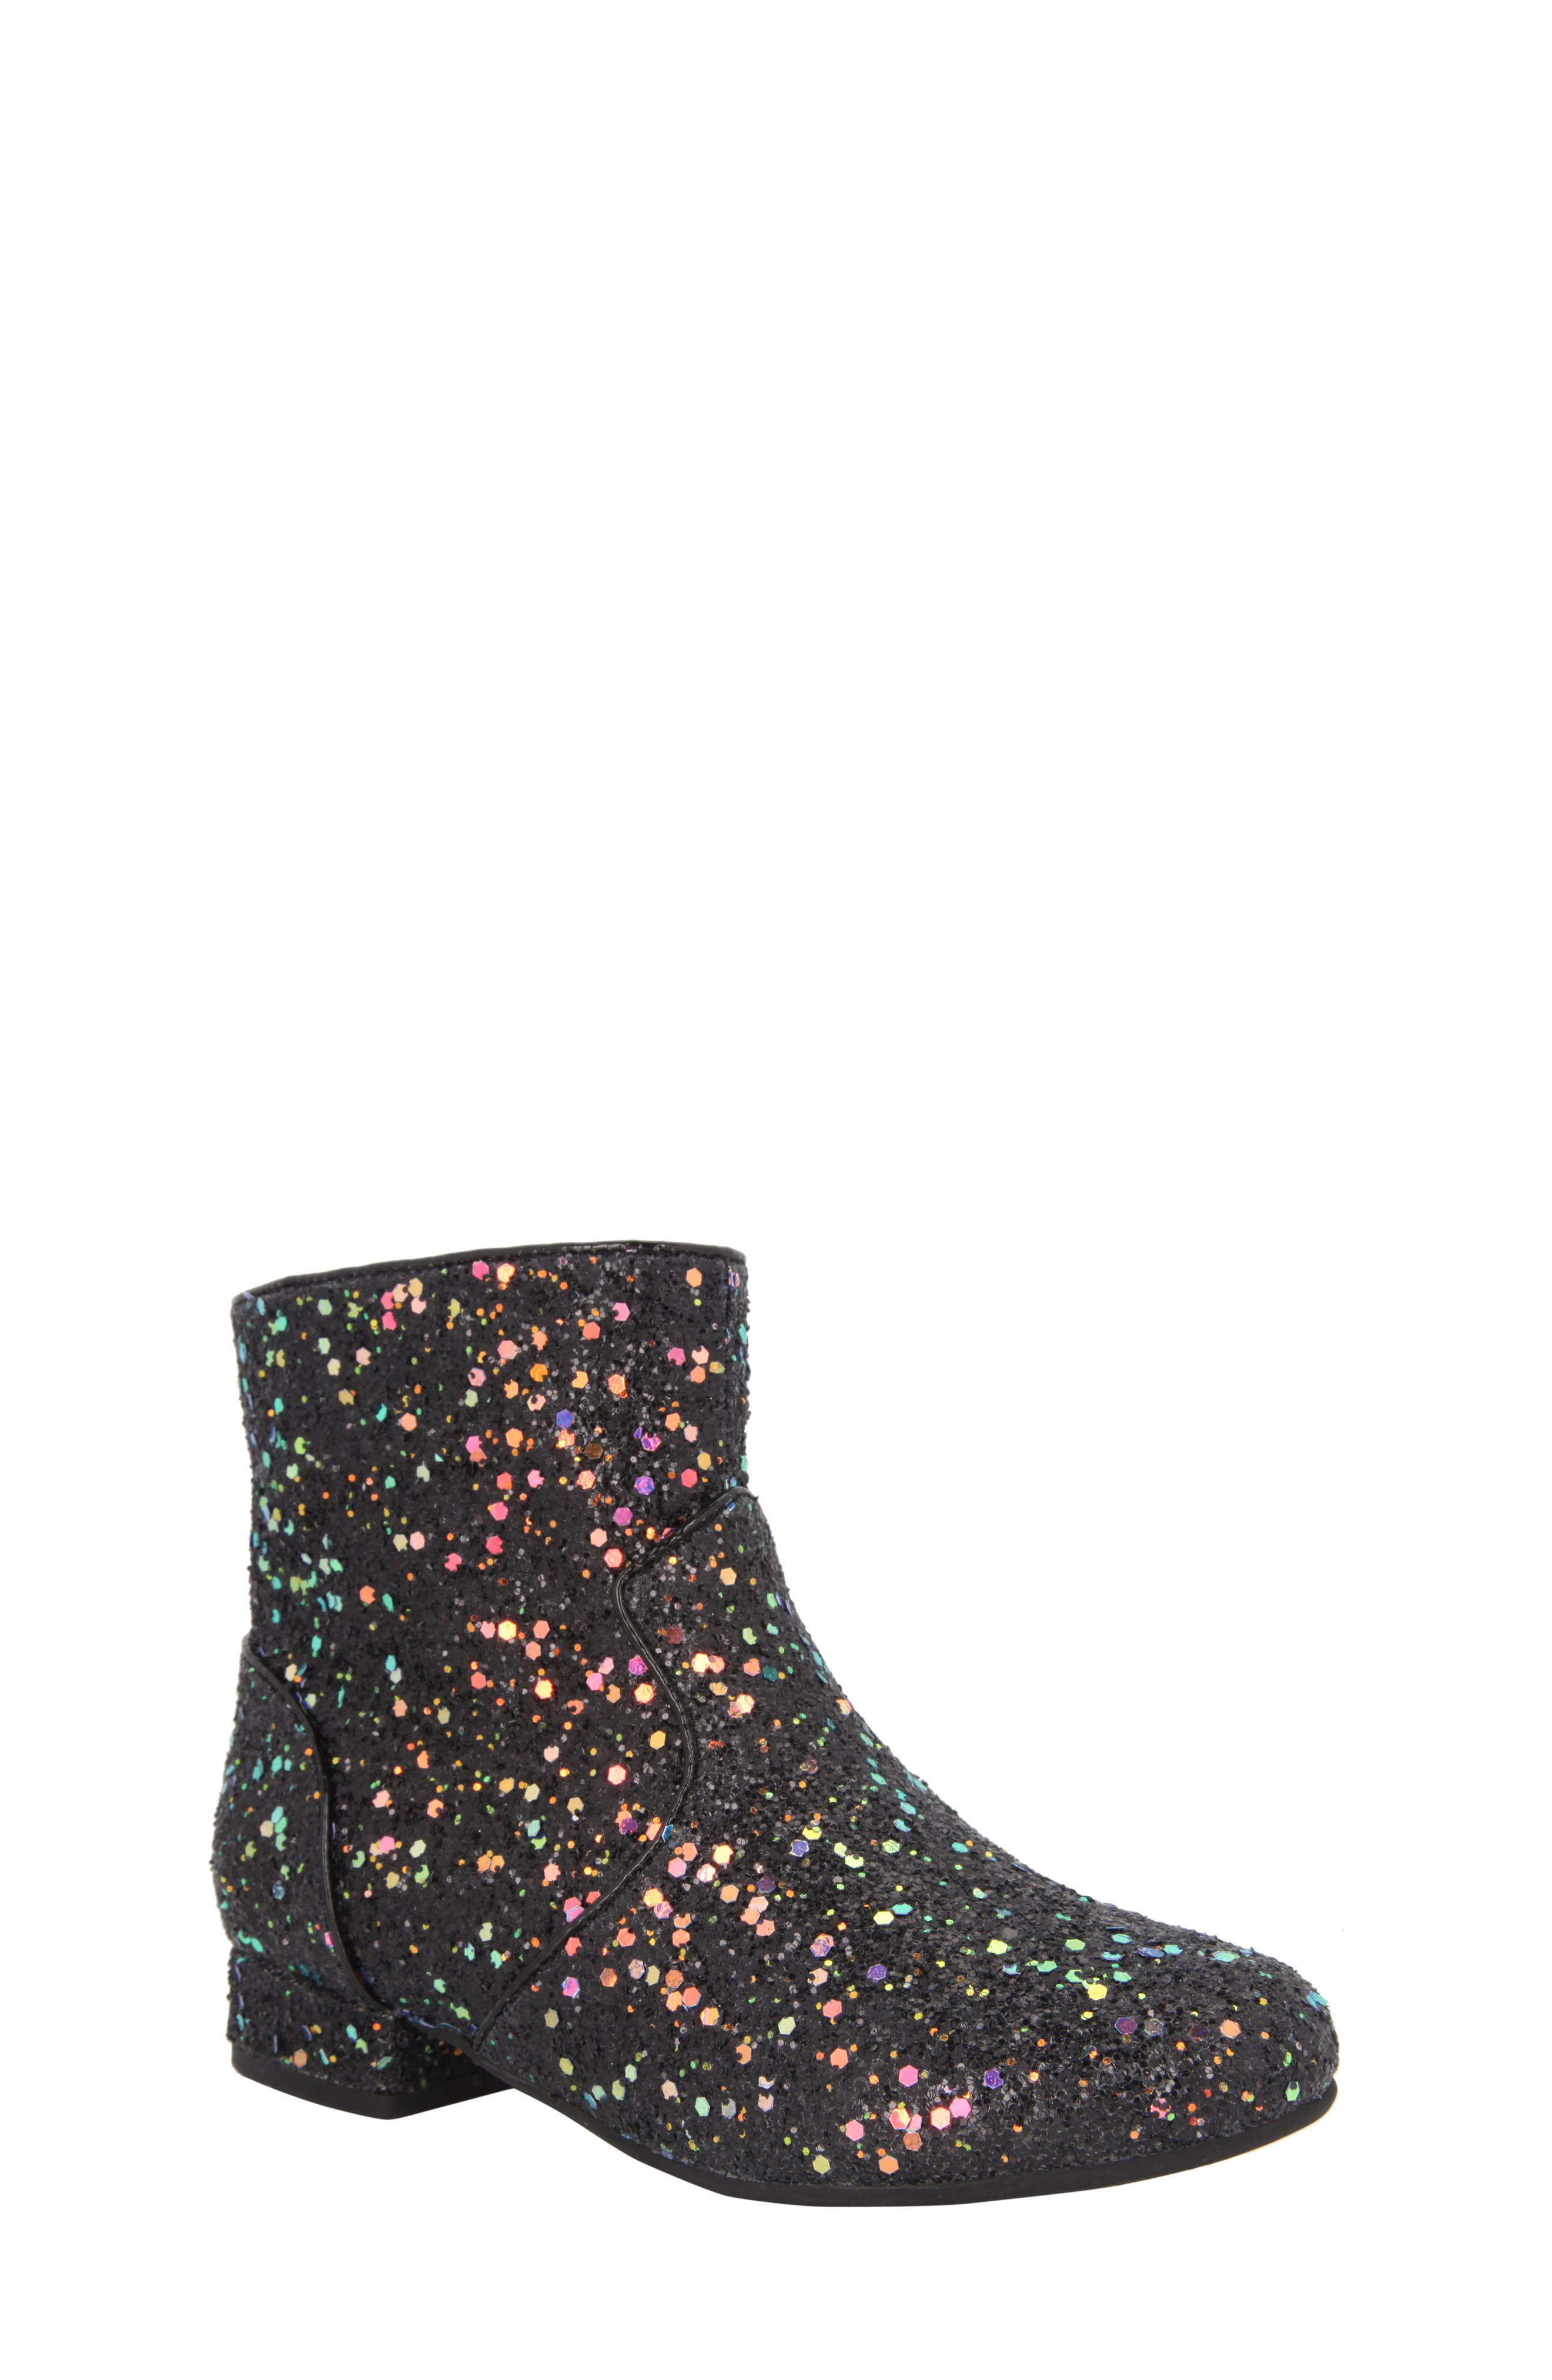 Amy Multicolor Glitter Bootie,                         Main,                         color, Black Chunky Glitter